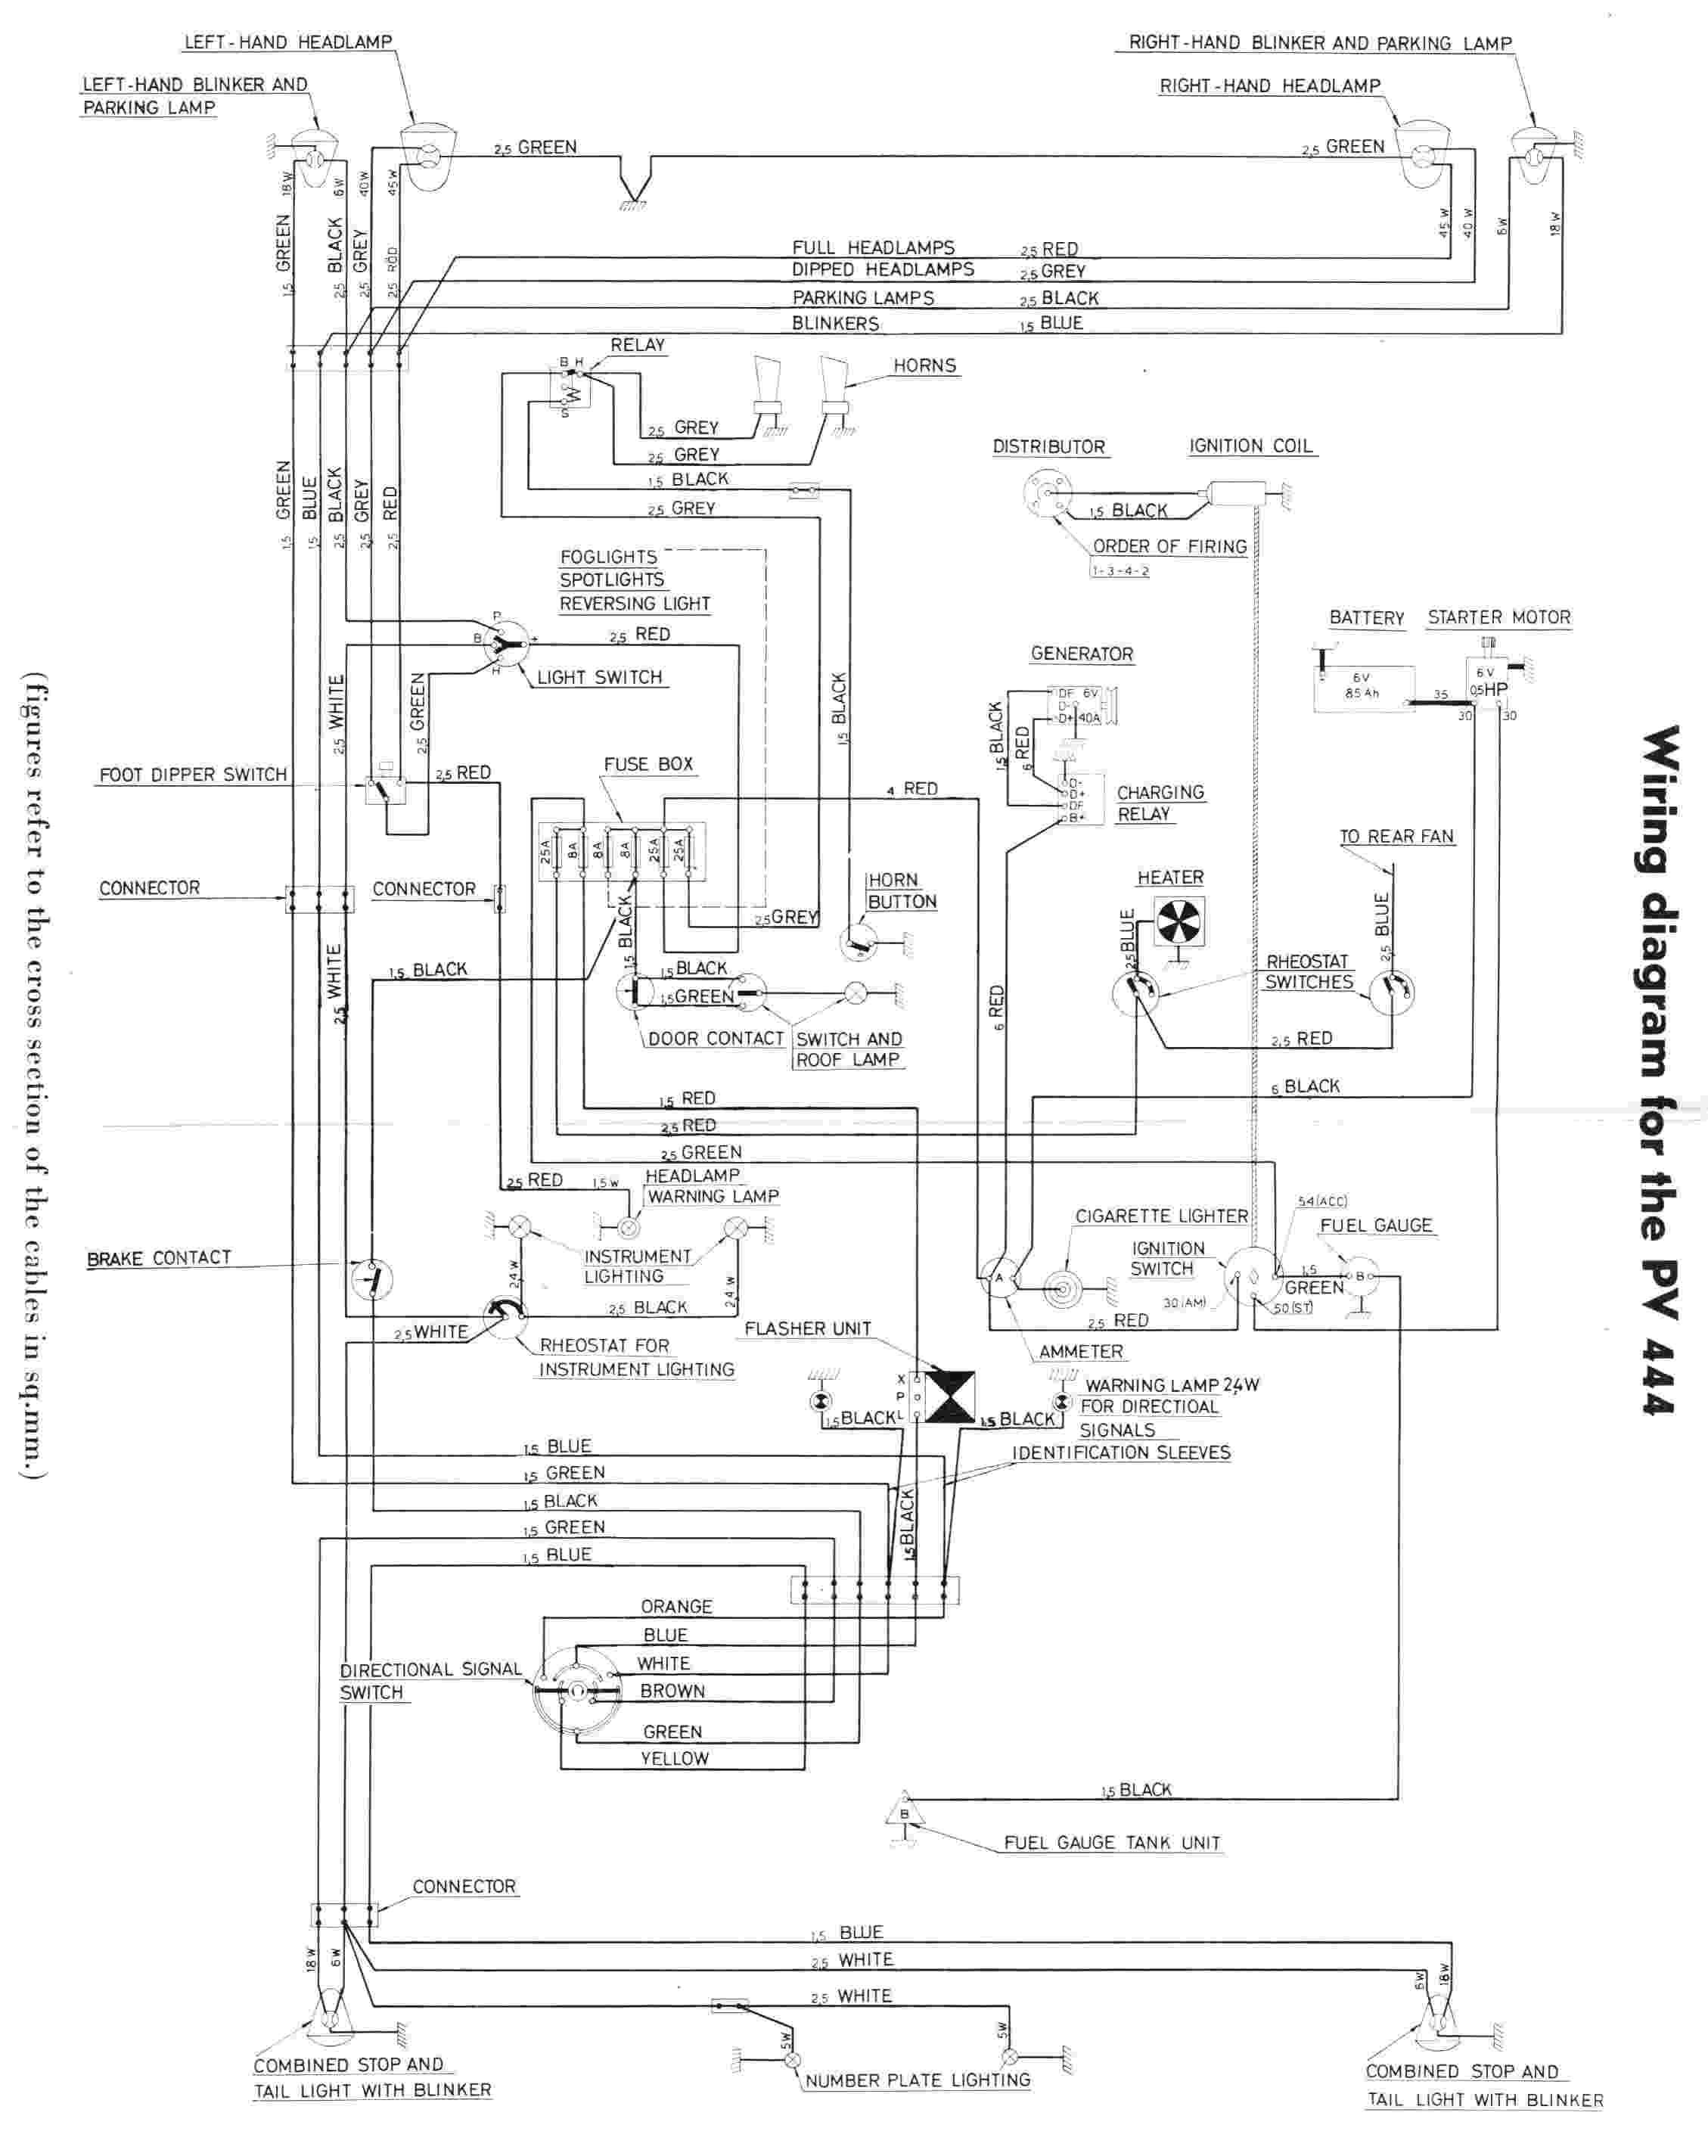 Wiring Diagram Boat Volvo | Volvo Truck Wiring Diagrams Pdf |  | Wiring Diagram